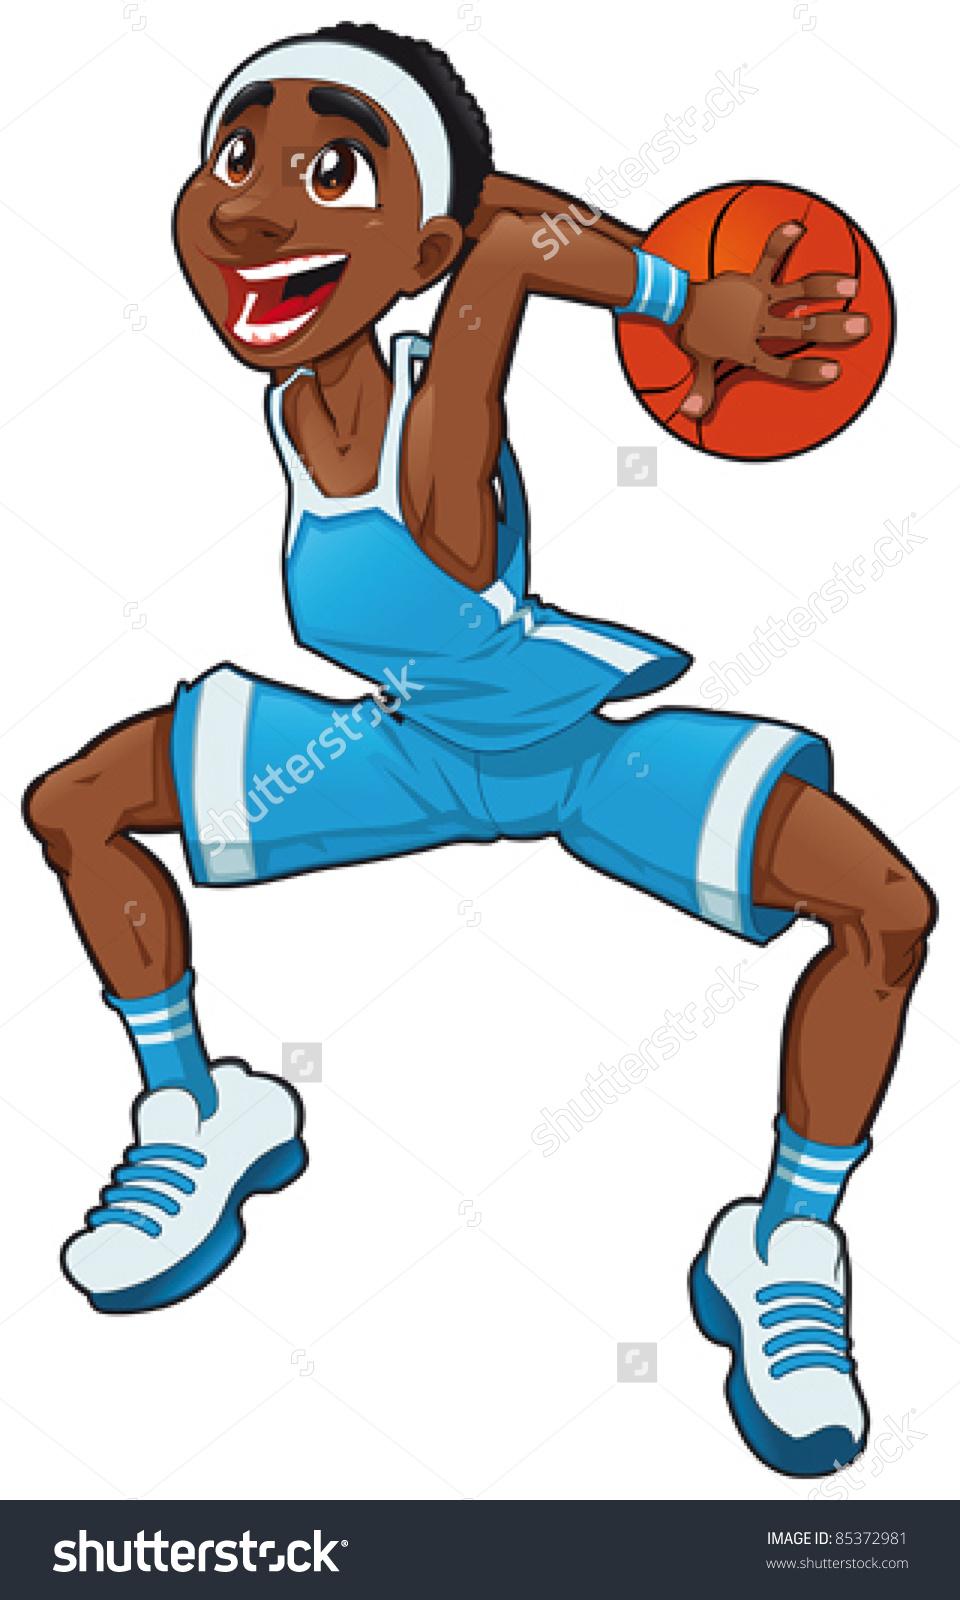 Basketball Boy Funny Cartoon Vector Isolated Stock Vector 85372981.